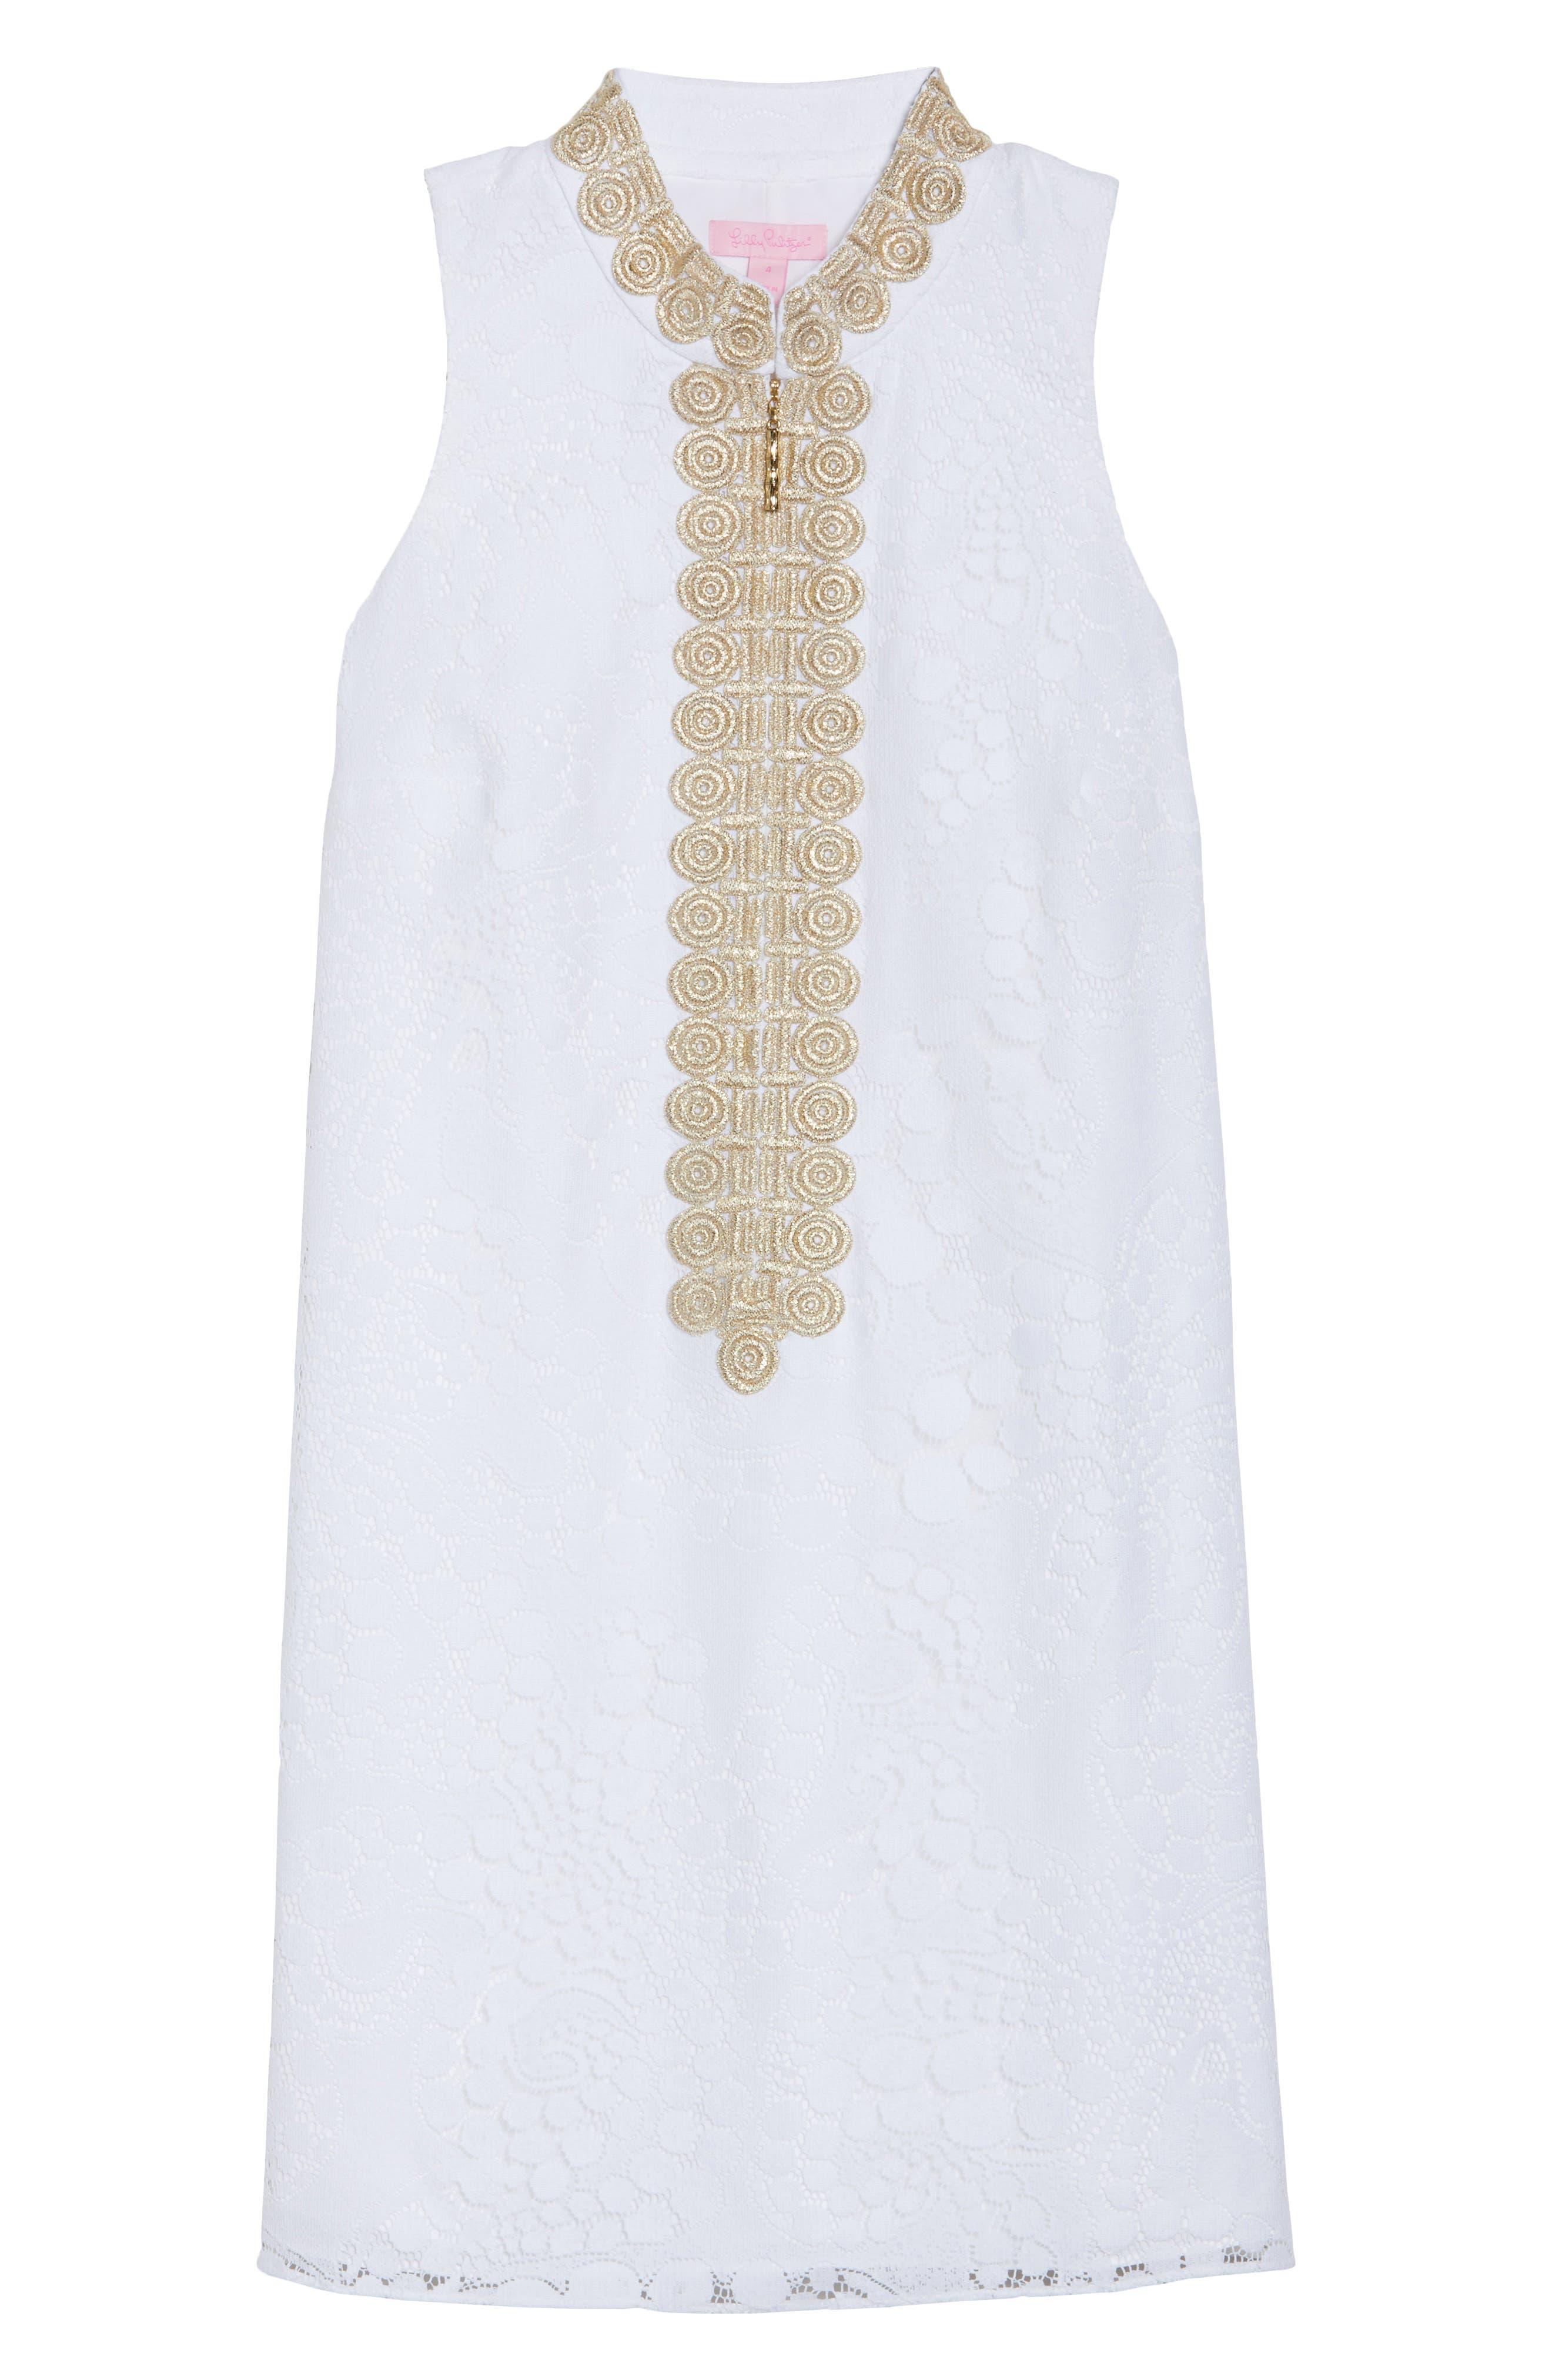 Jane Lace Shift Dress,                             Alternate thumbnail 7, color,                             Resort White Mocean Lace